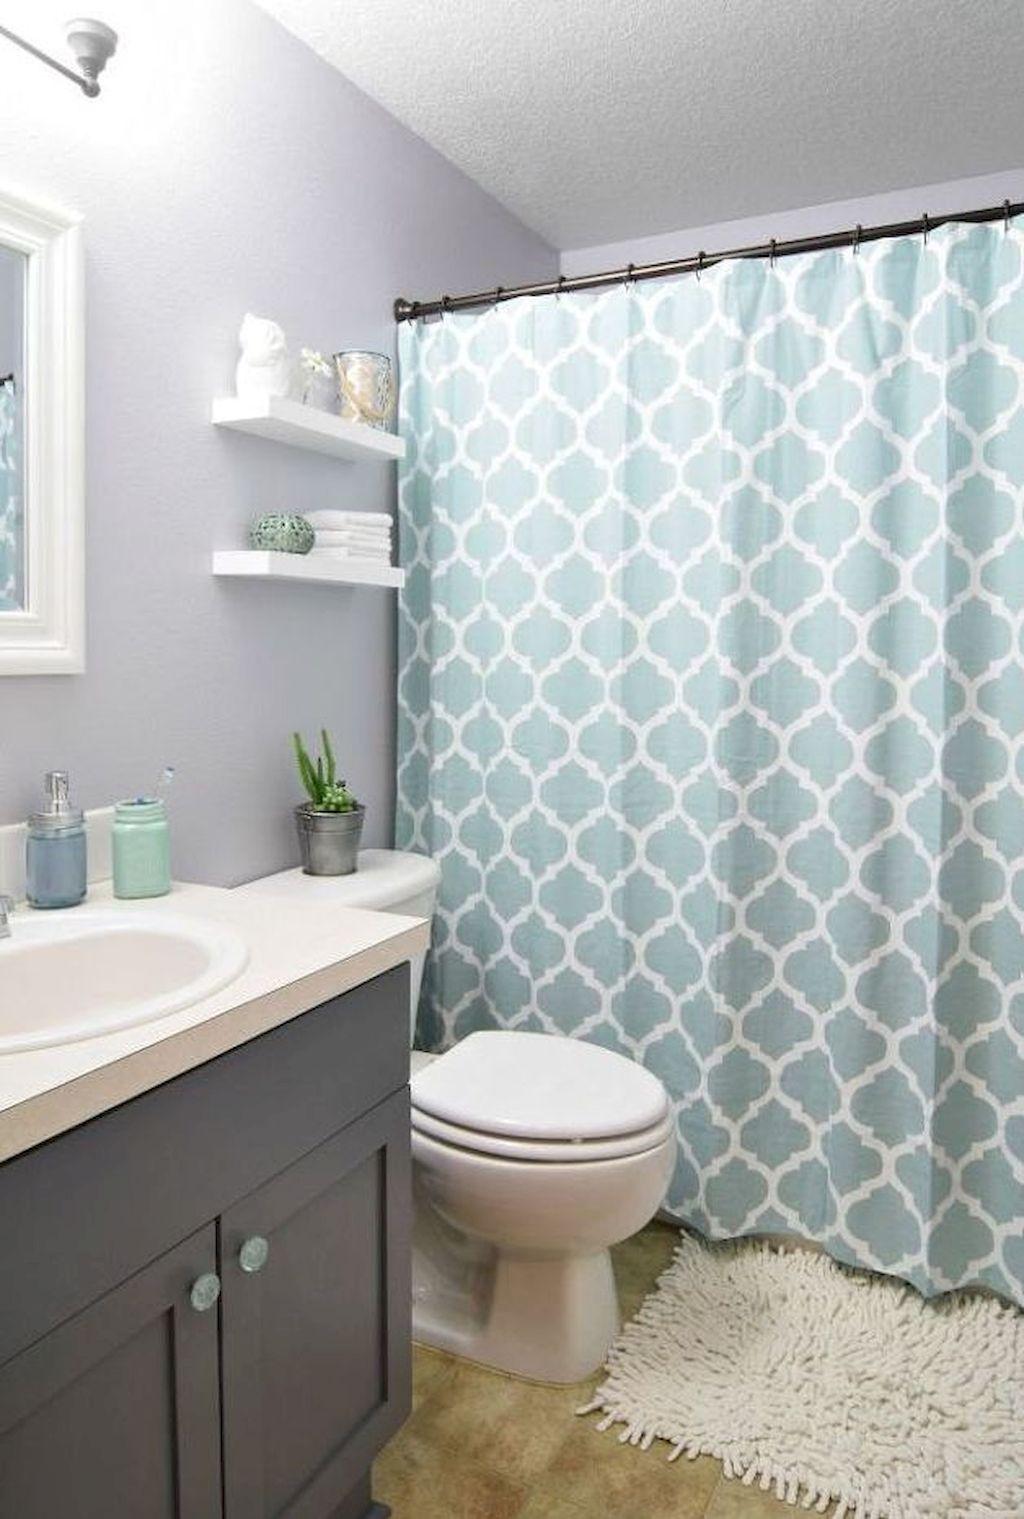 Apartment Bathroom Designs 85 Tiny Apartment Bathroom Decoration Ideas  Tiny Apartments